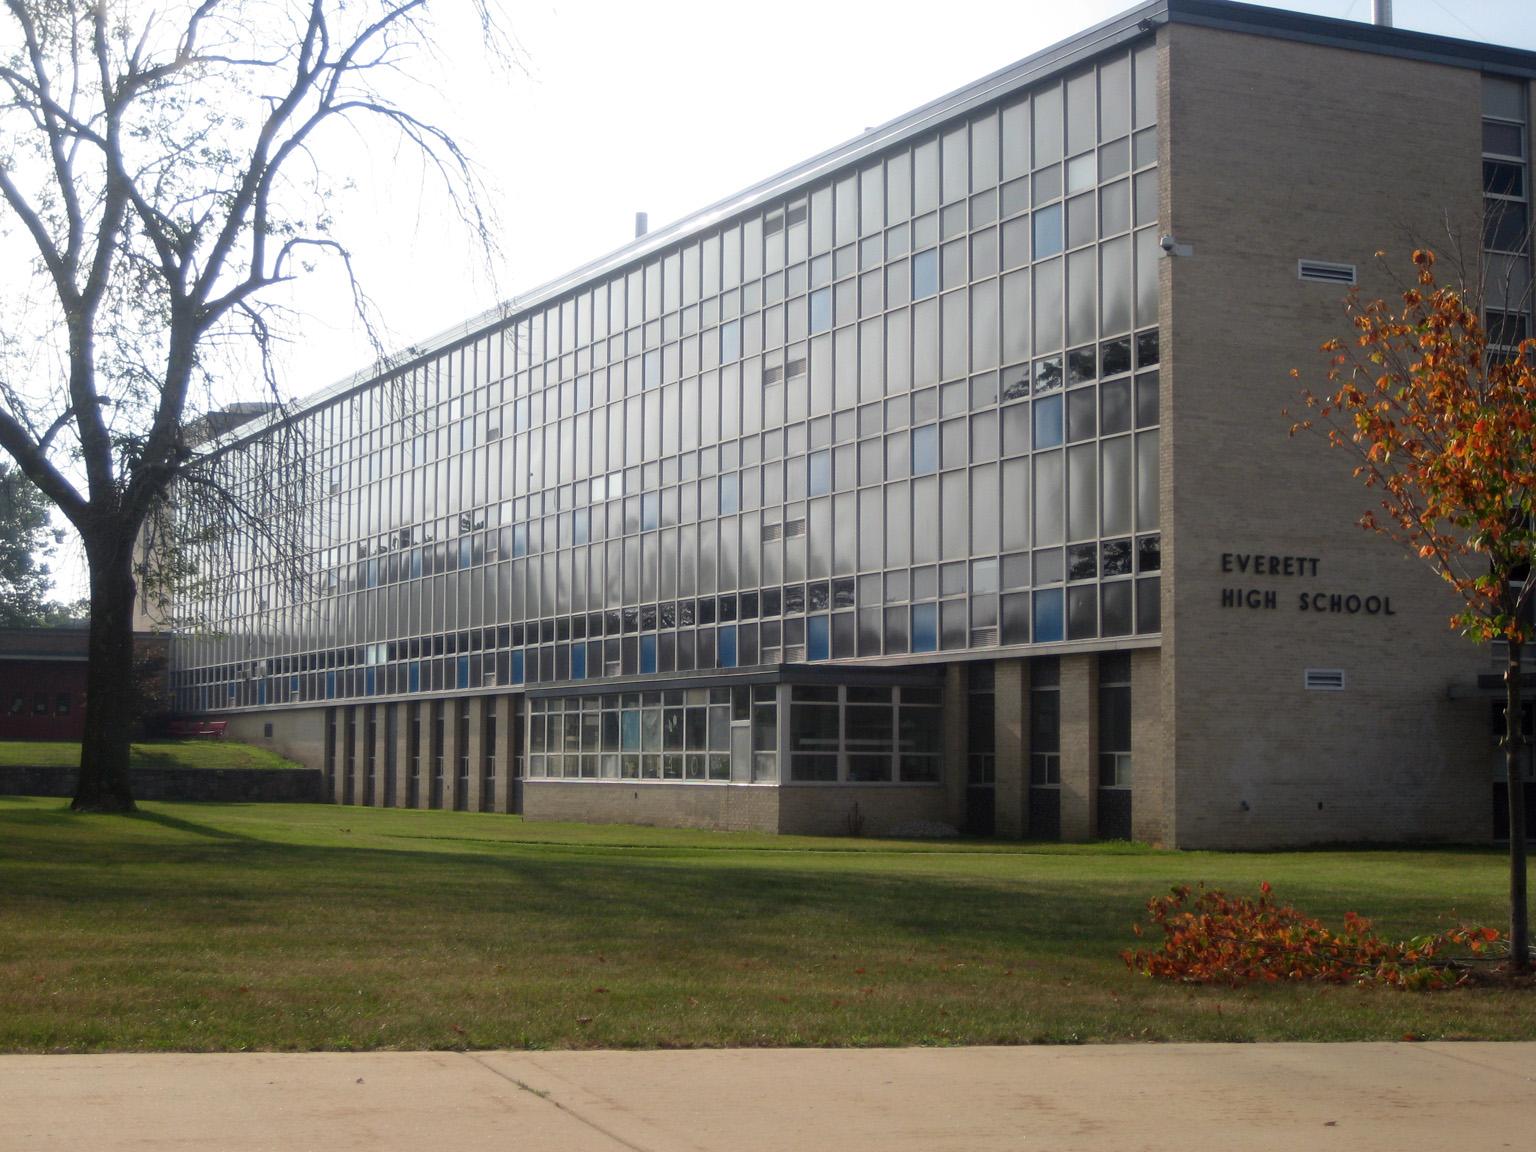 Everett High School (Michigan) - Wikipedia